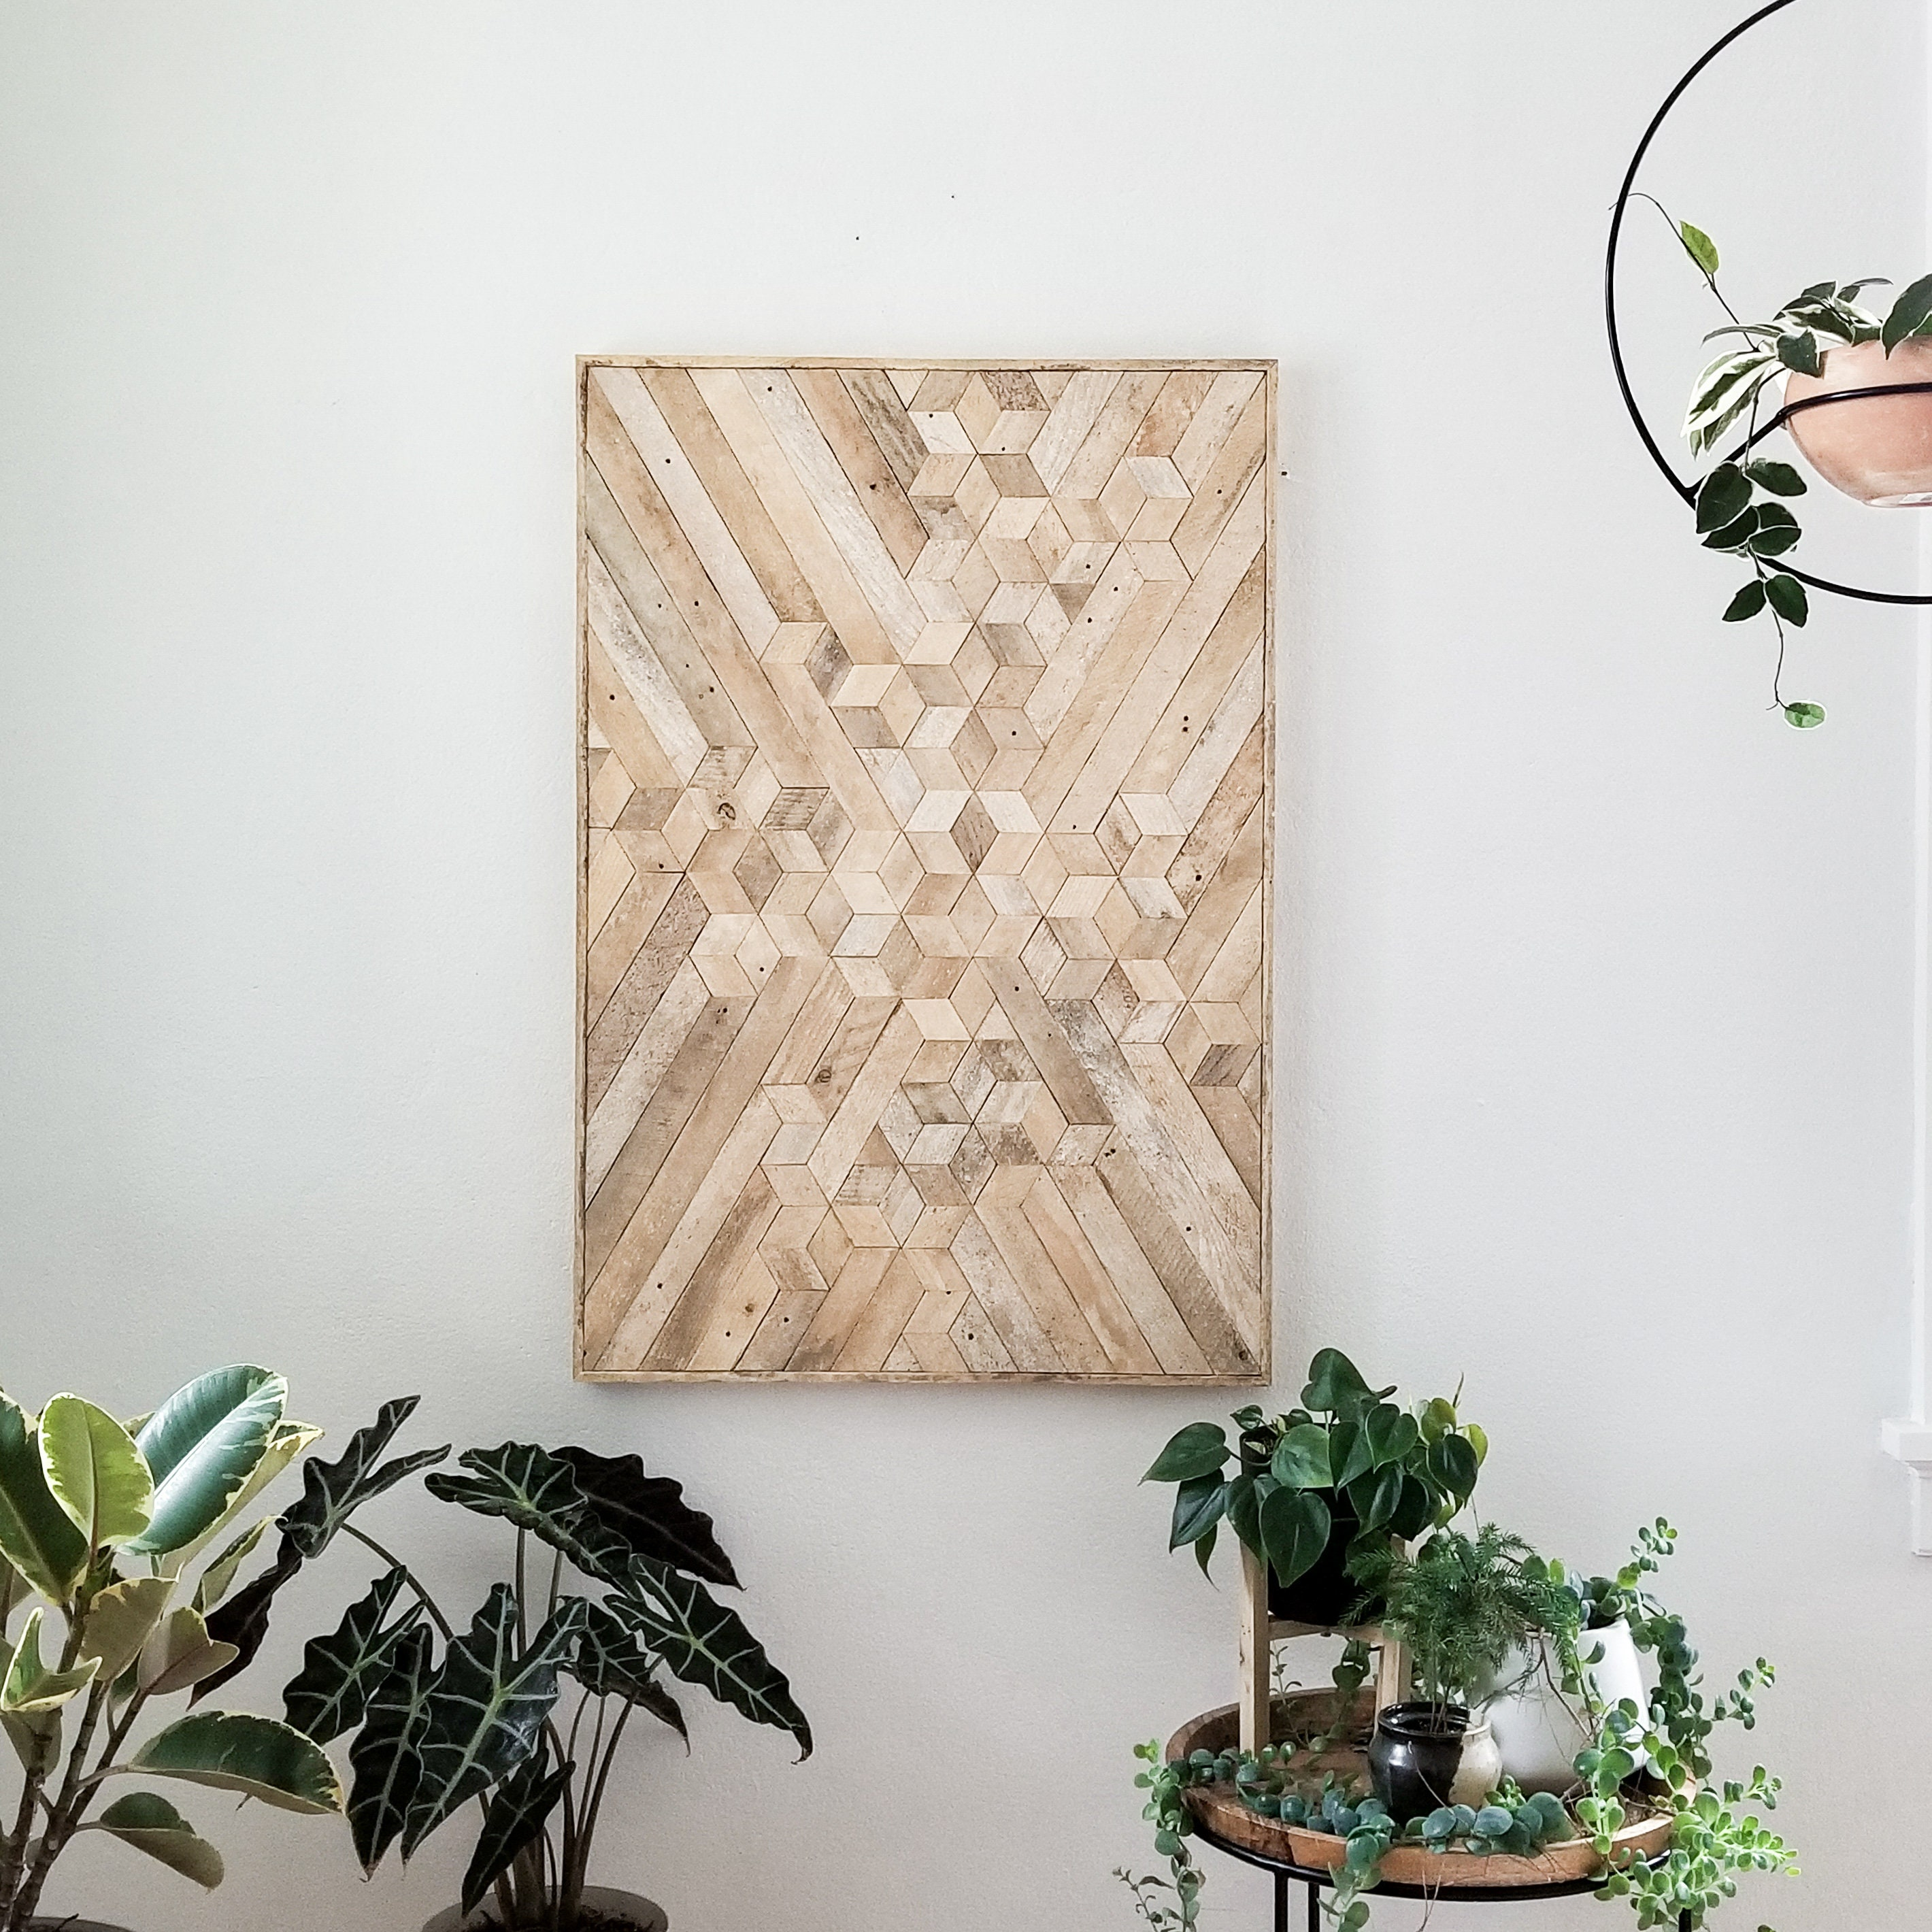 Reclaimed Wood Wall Art | Wood Wall Art | Wood Decor ...